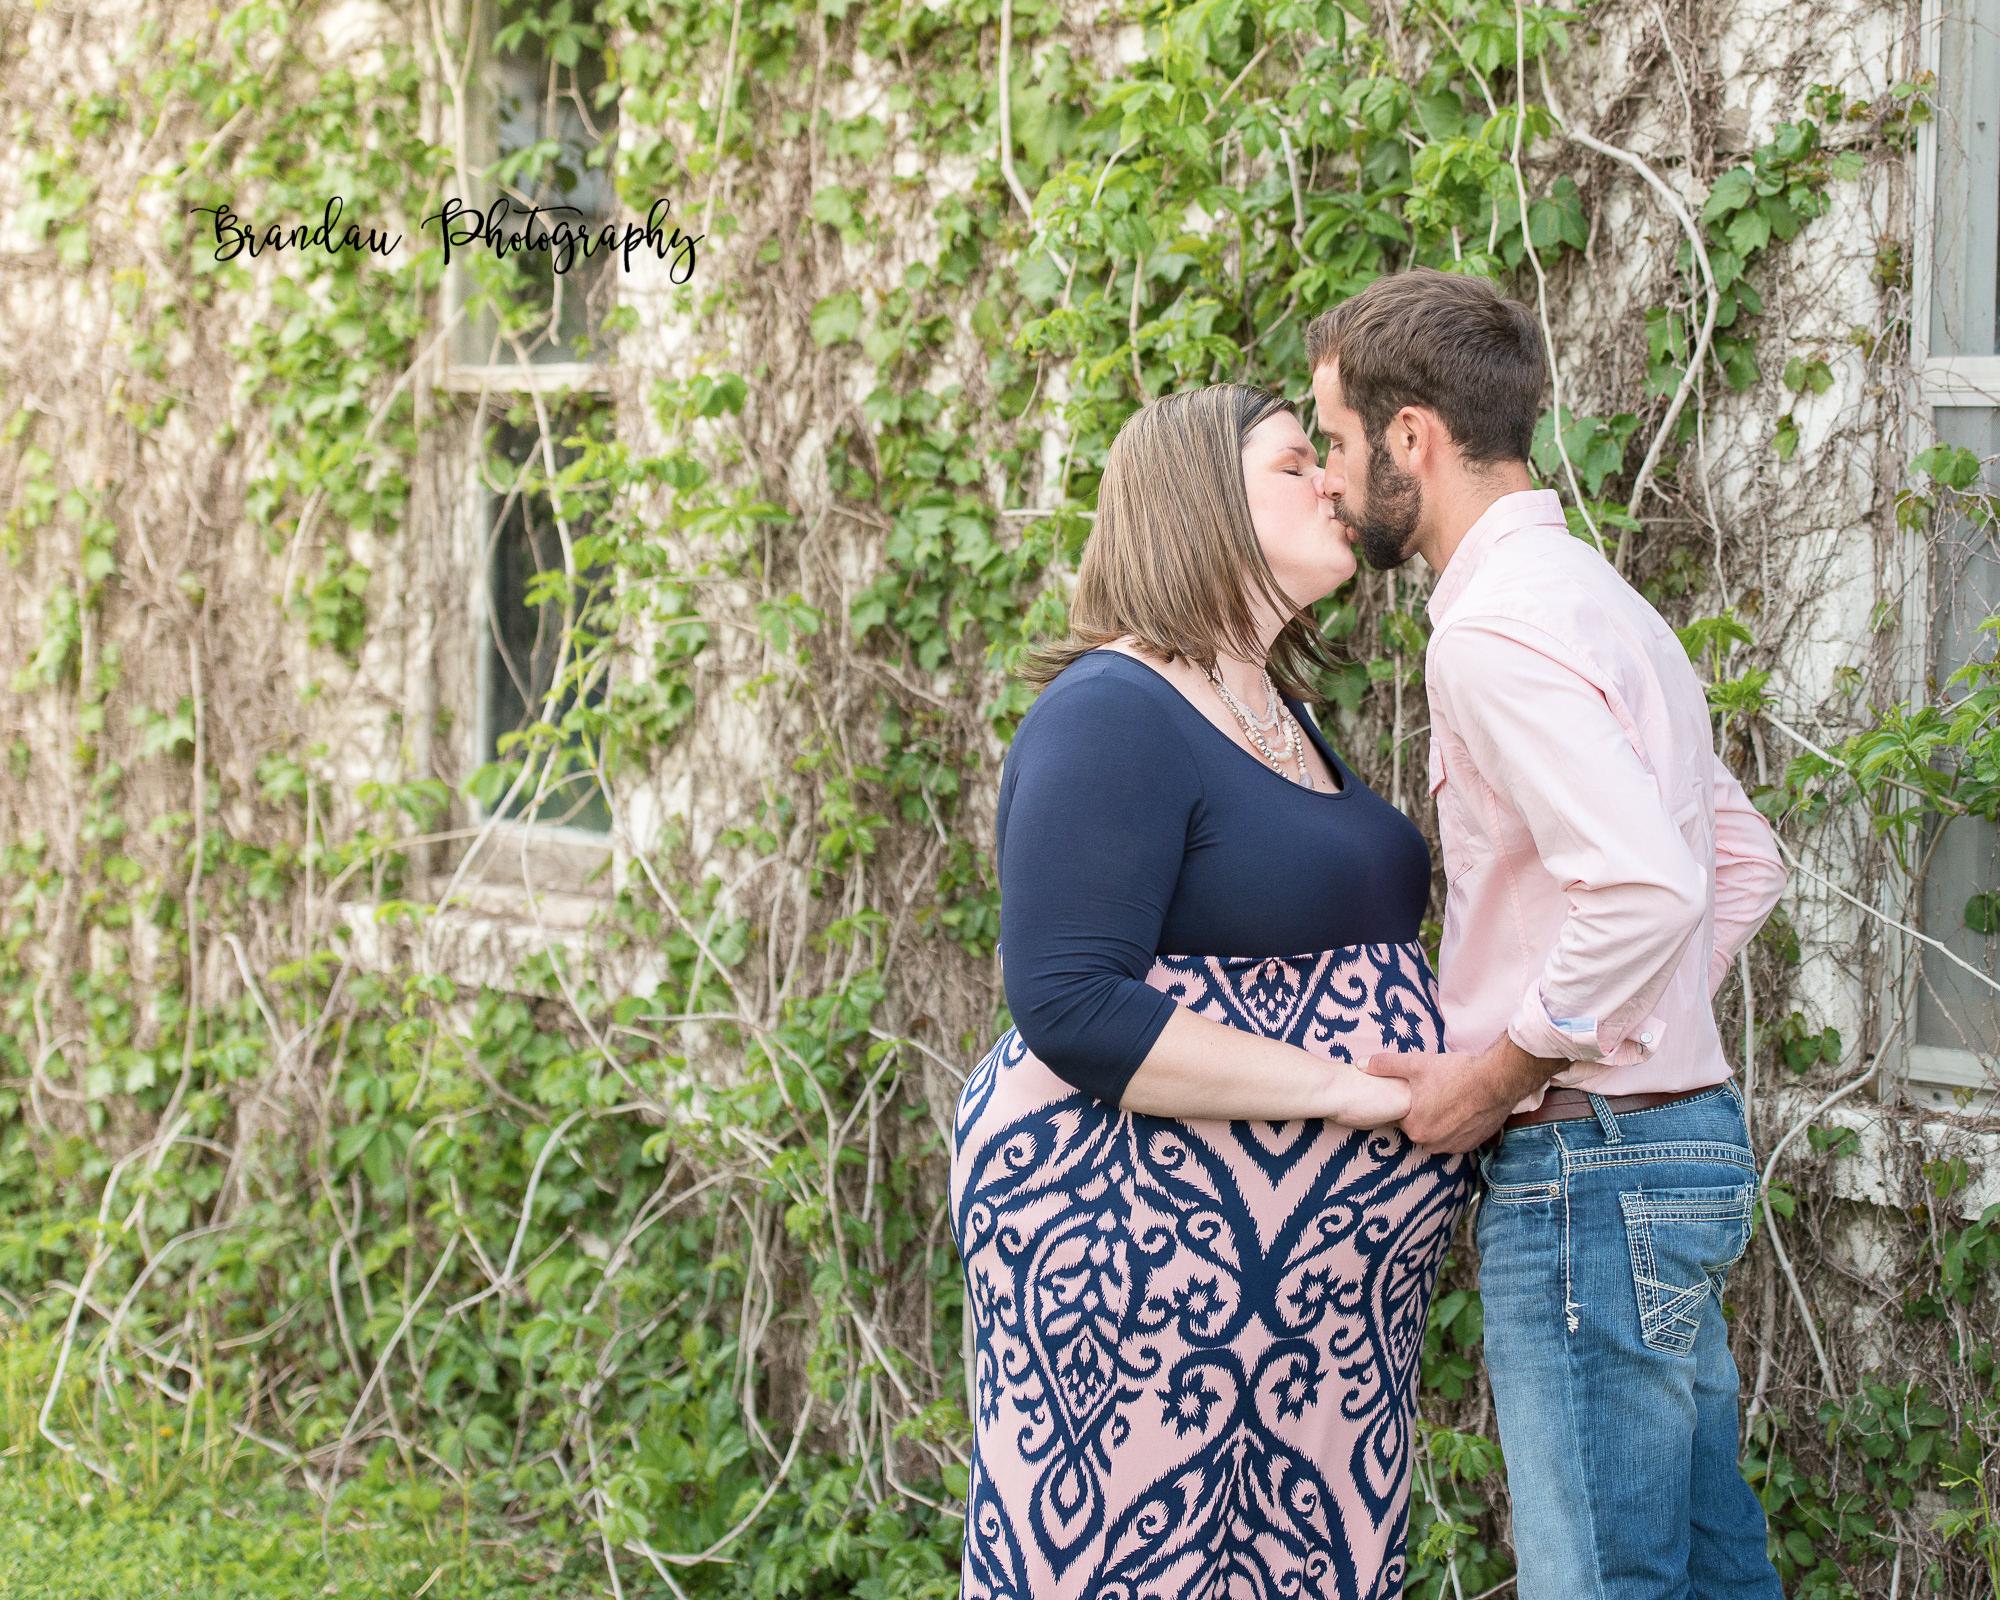 Engagement Kissing Rural Iowa_Brandau Photography-30.jpg